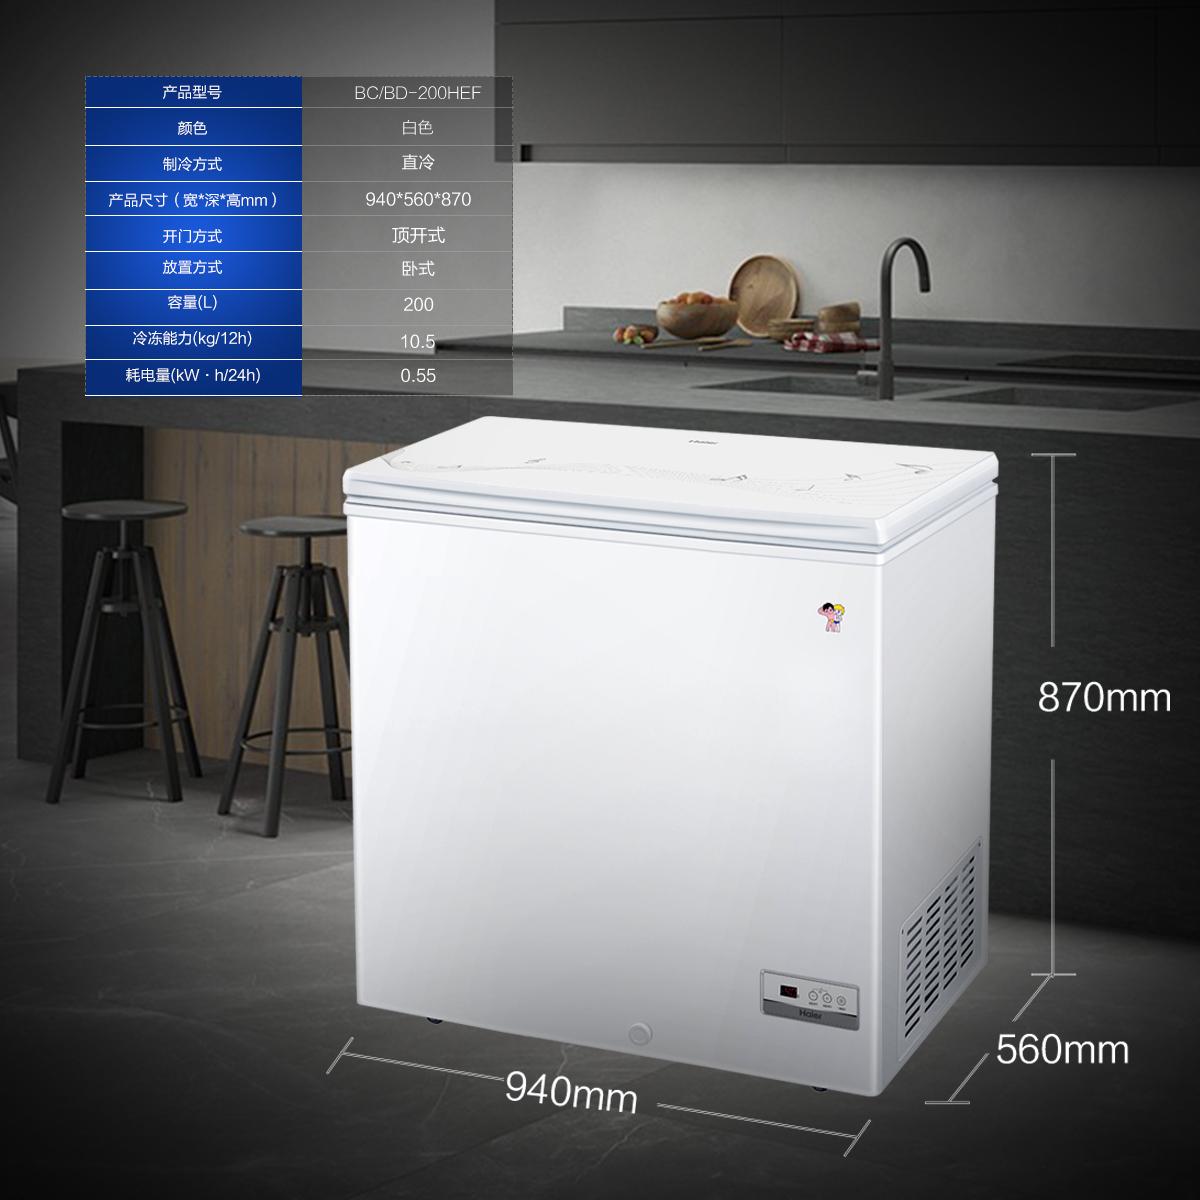 Haier/海尔 冷柜 BC/BD-200HEF 200升-40℃细胞级冷冻电子智能温控冷柜 冰蓝系列